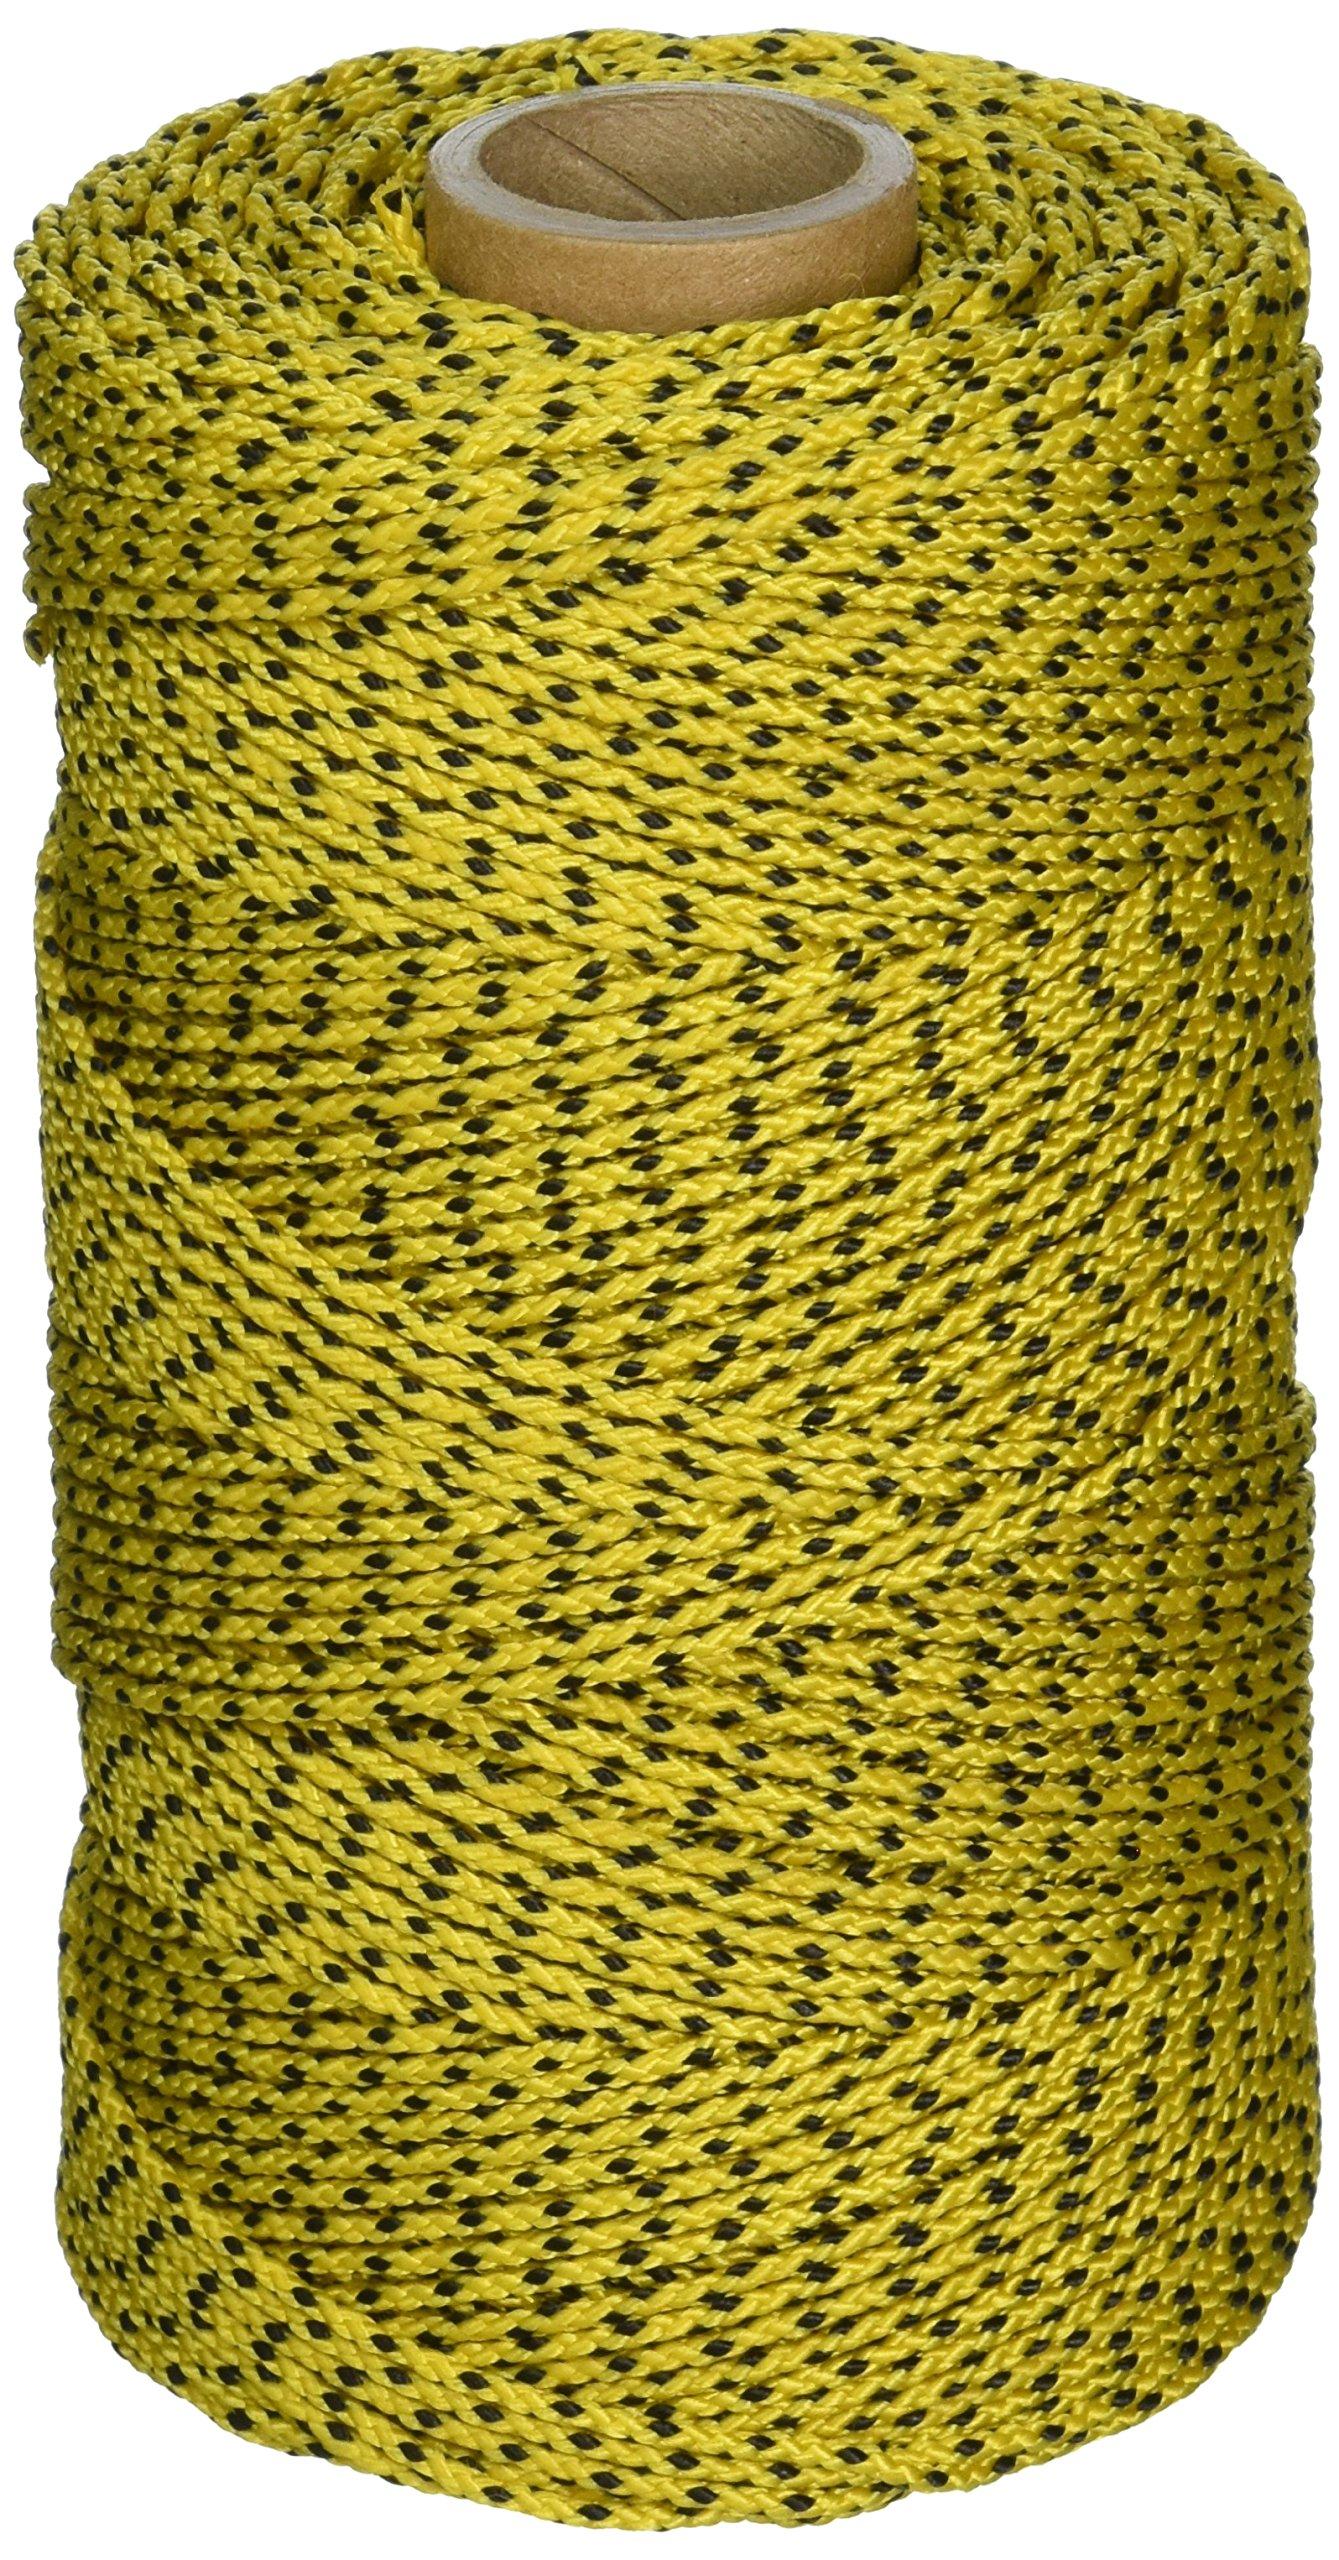 W. Rose RO685 Super Tough Professional Bonded Braided Nylon Masons Line, 685-Feet, Yellow/Black